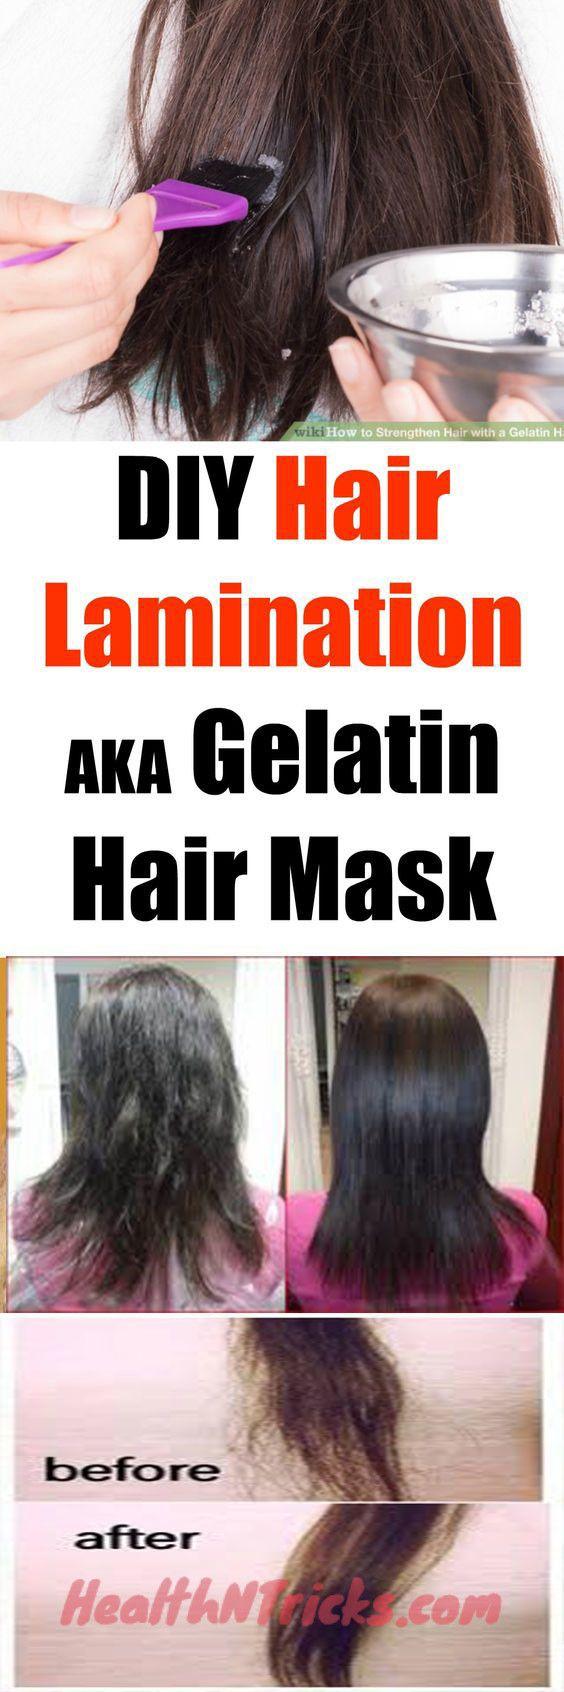 Gelatin mask for hair restoration